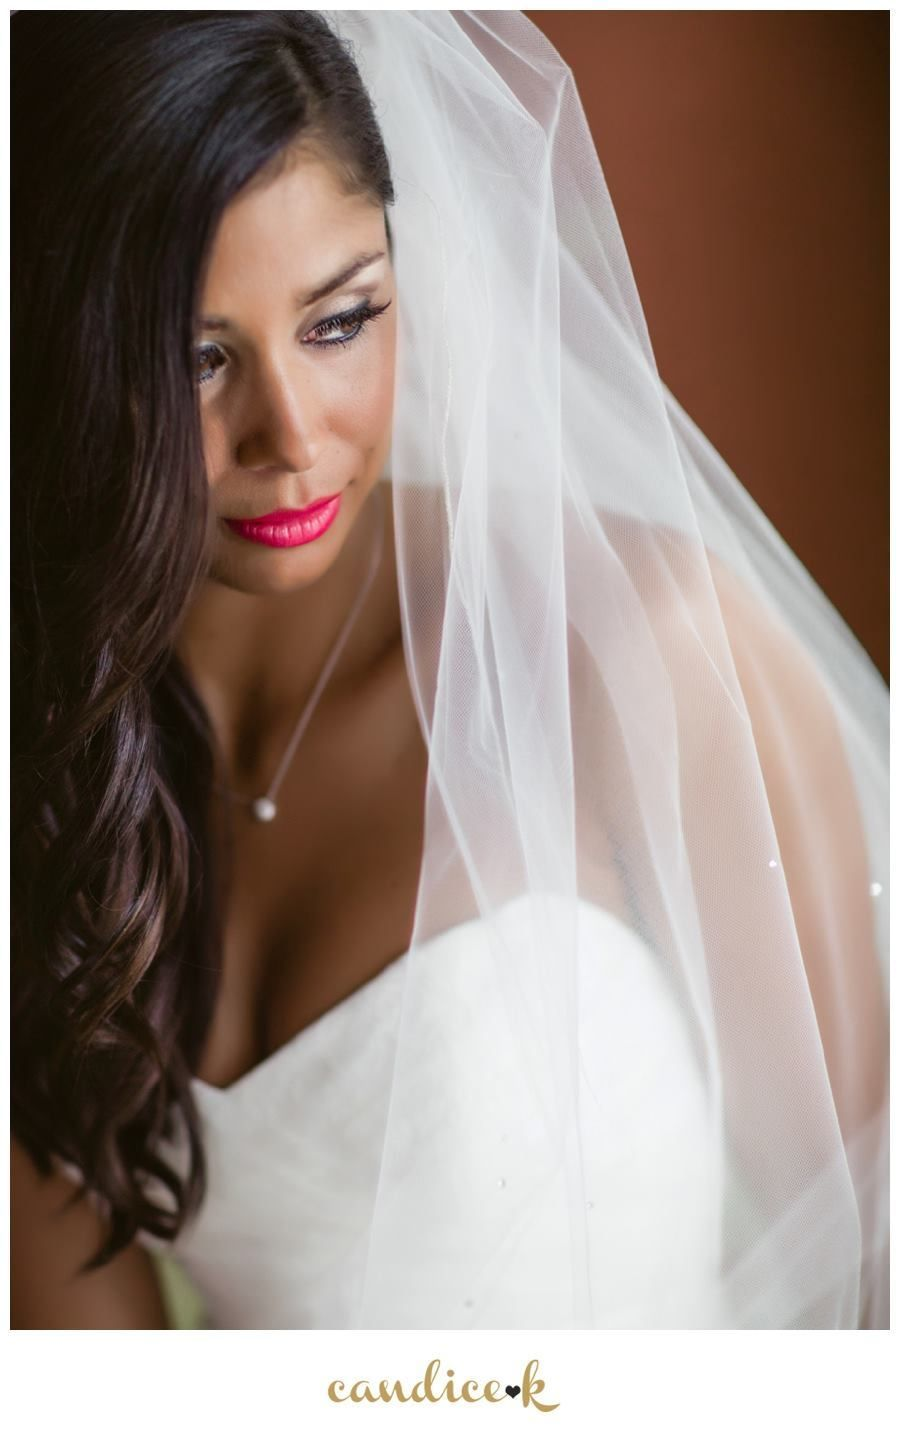 candice k photography -- make me blush destin hairstylist and makeup